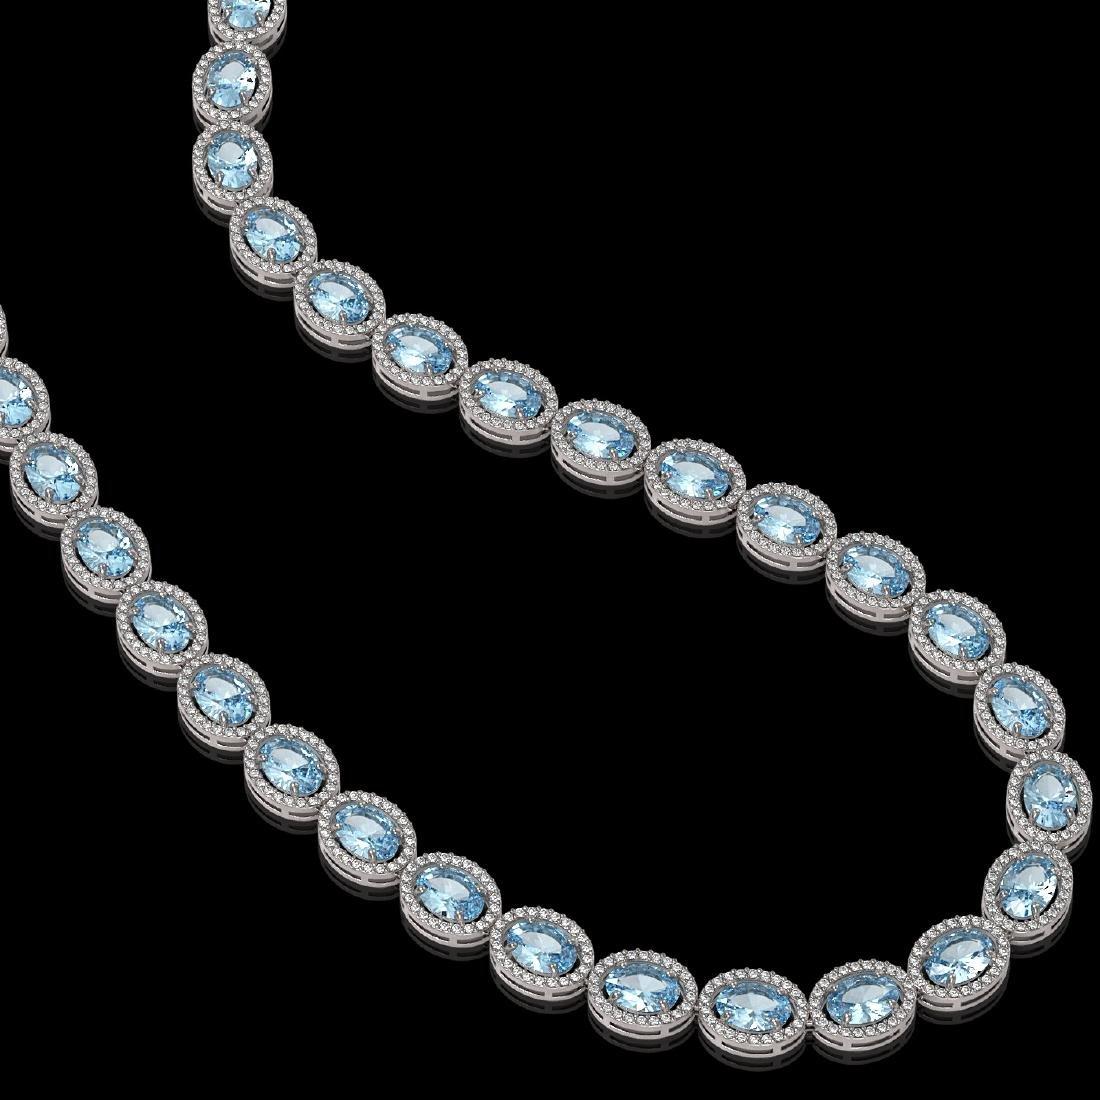 41.88 CTW Aquamarine & Diamond Halo Necklace 10K White - 2